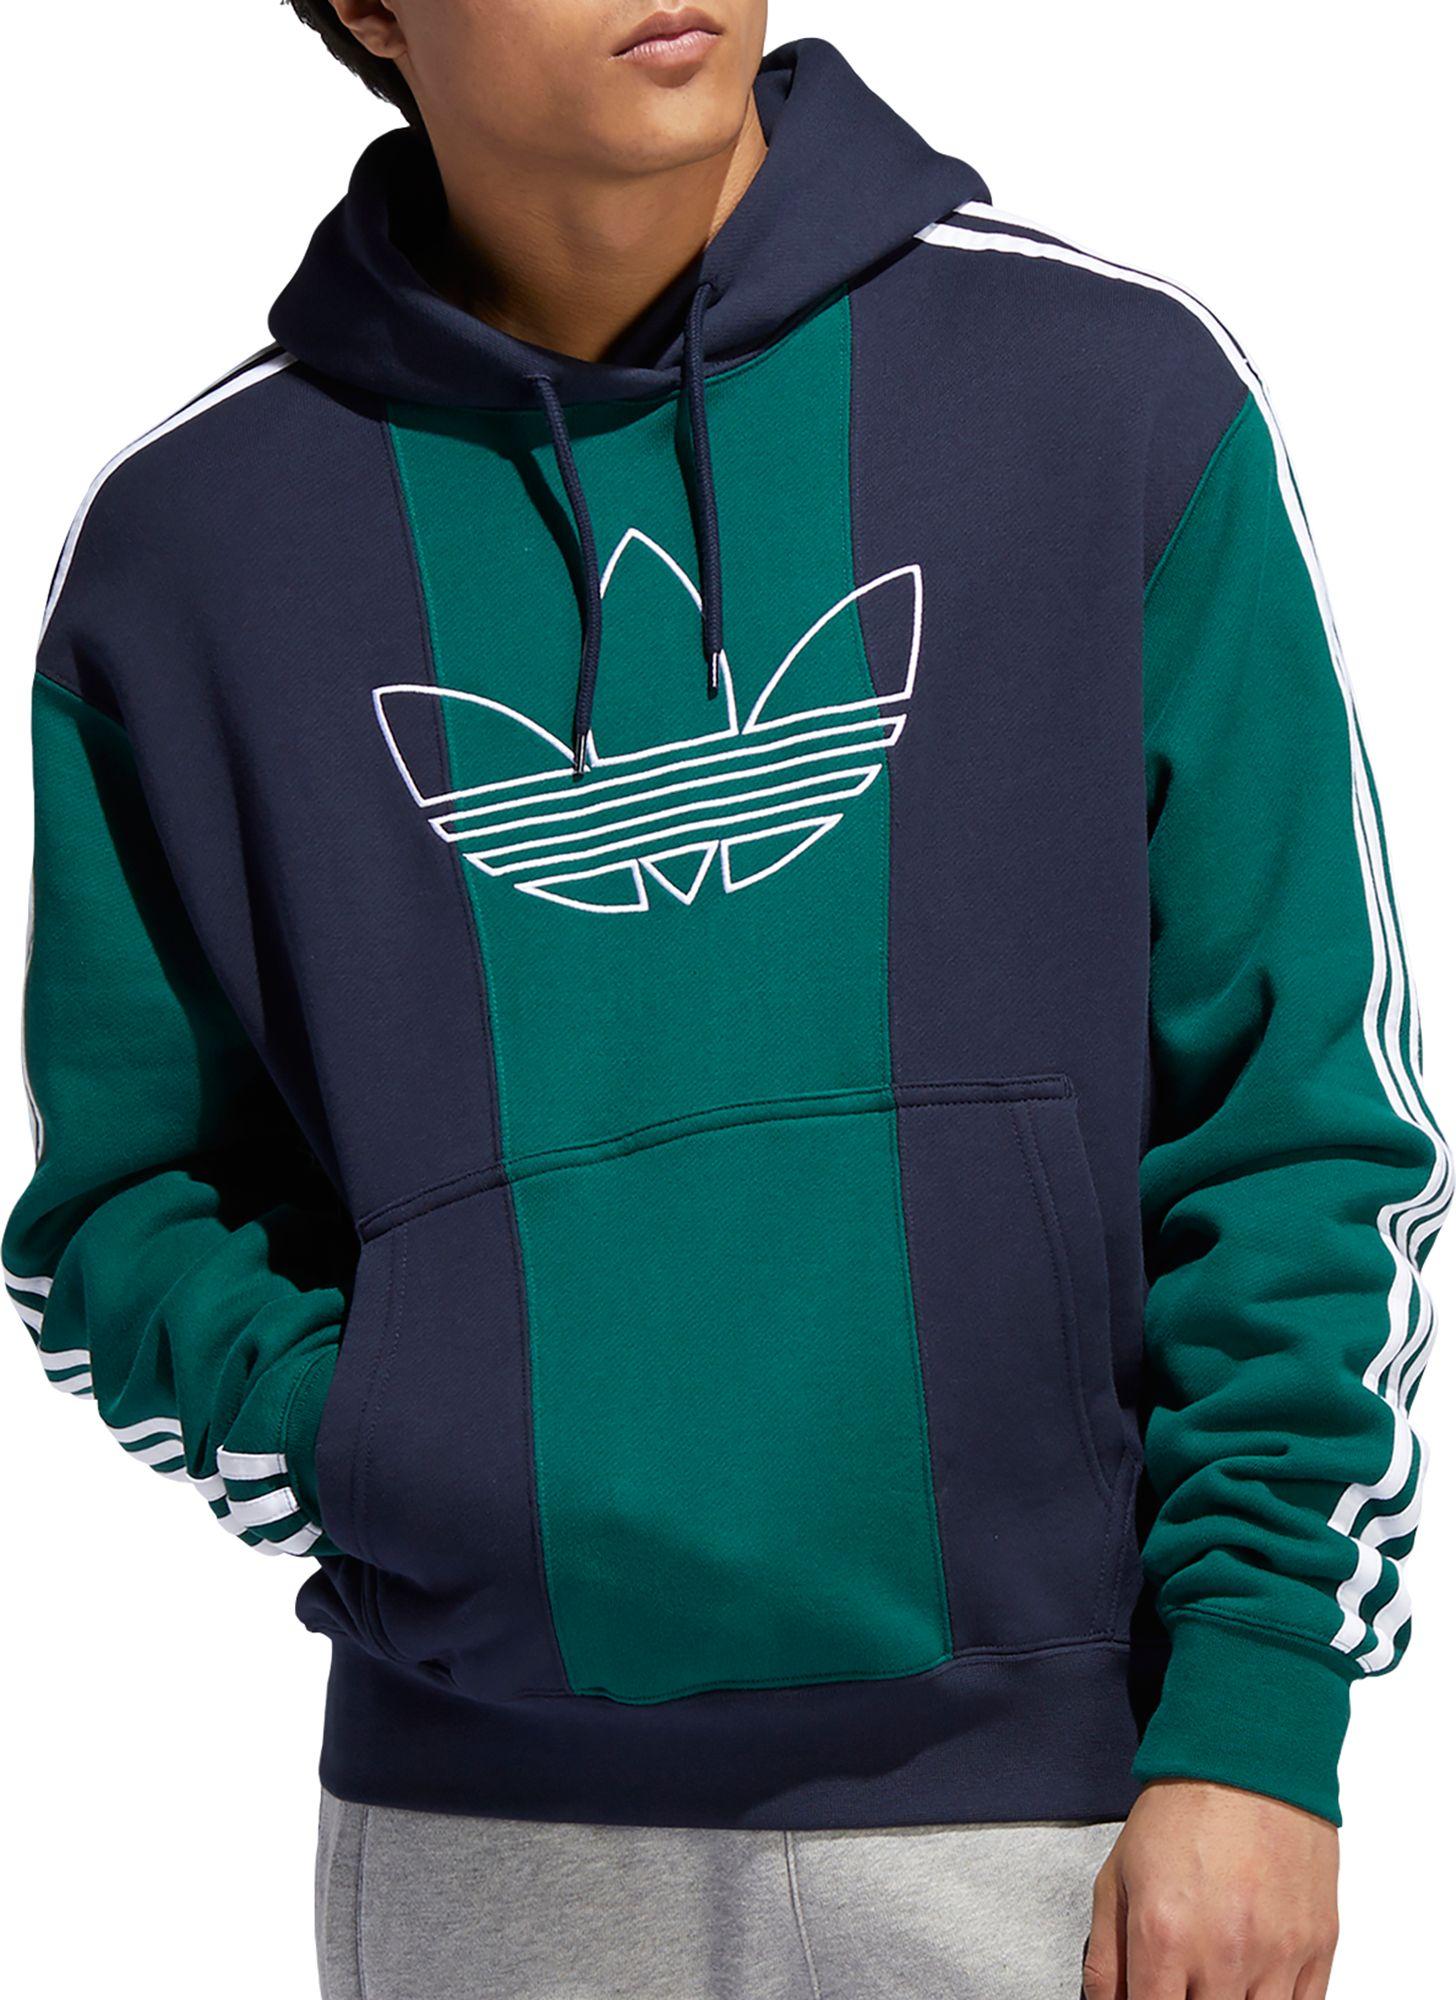 adidas originals zipper | Large choice |